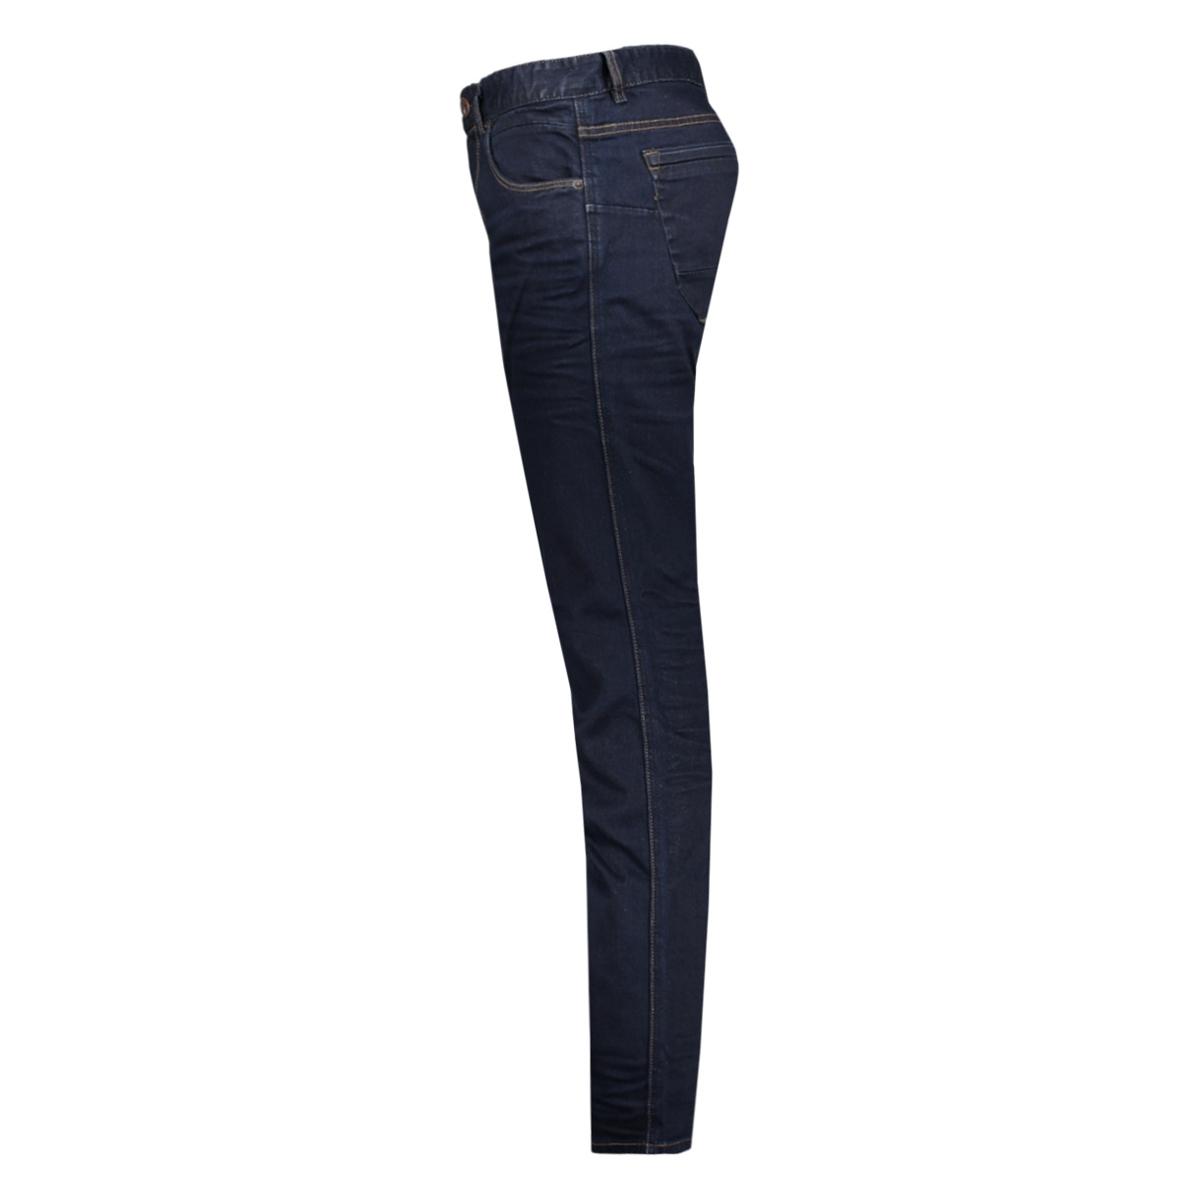 nightflight stretch denim ptr120 pme legend jeans rnd